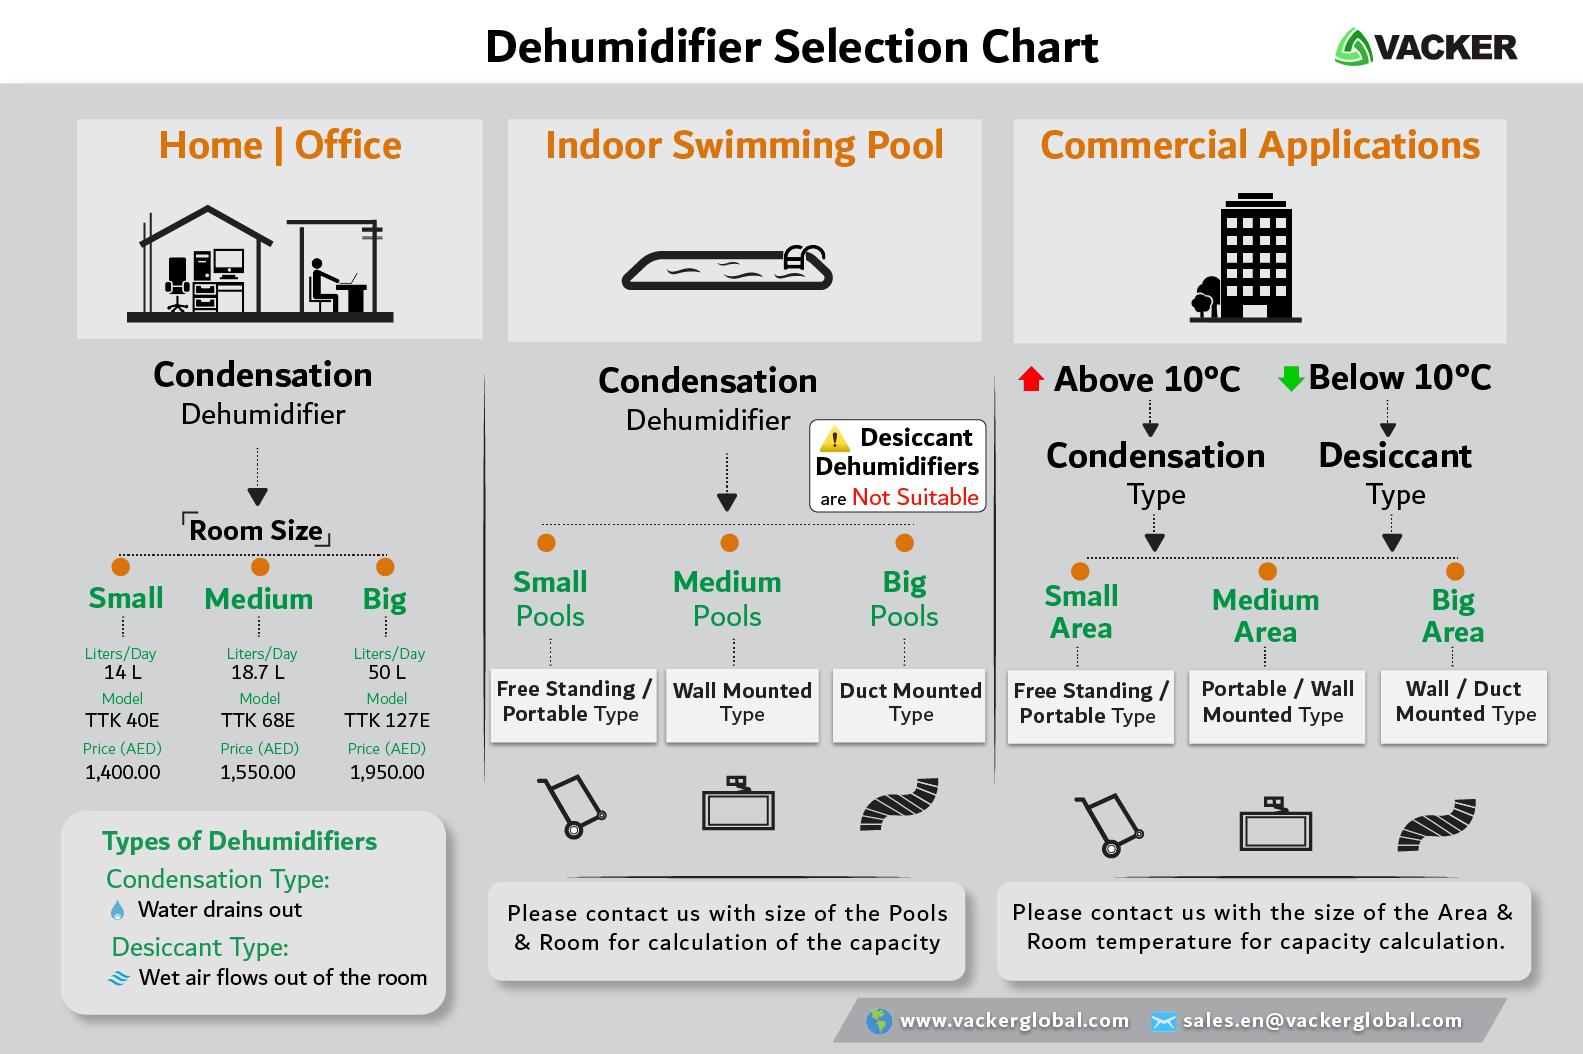 How-to-select-dehumidifier-and-humidifier-Dubai-Abudhabi-Qatar-Oman-Kuwait-Saudi